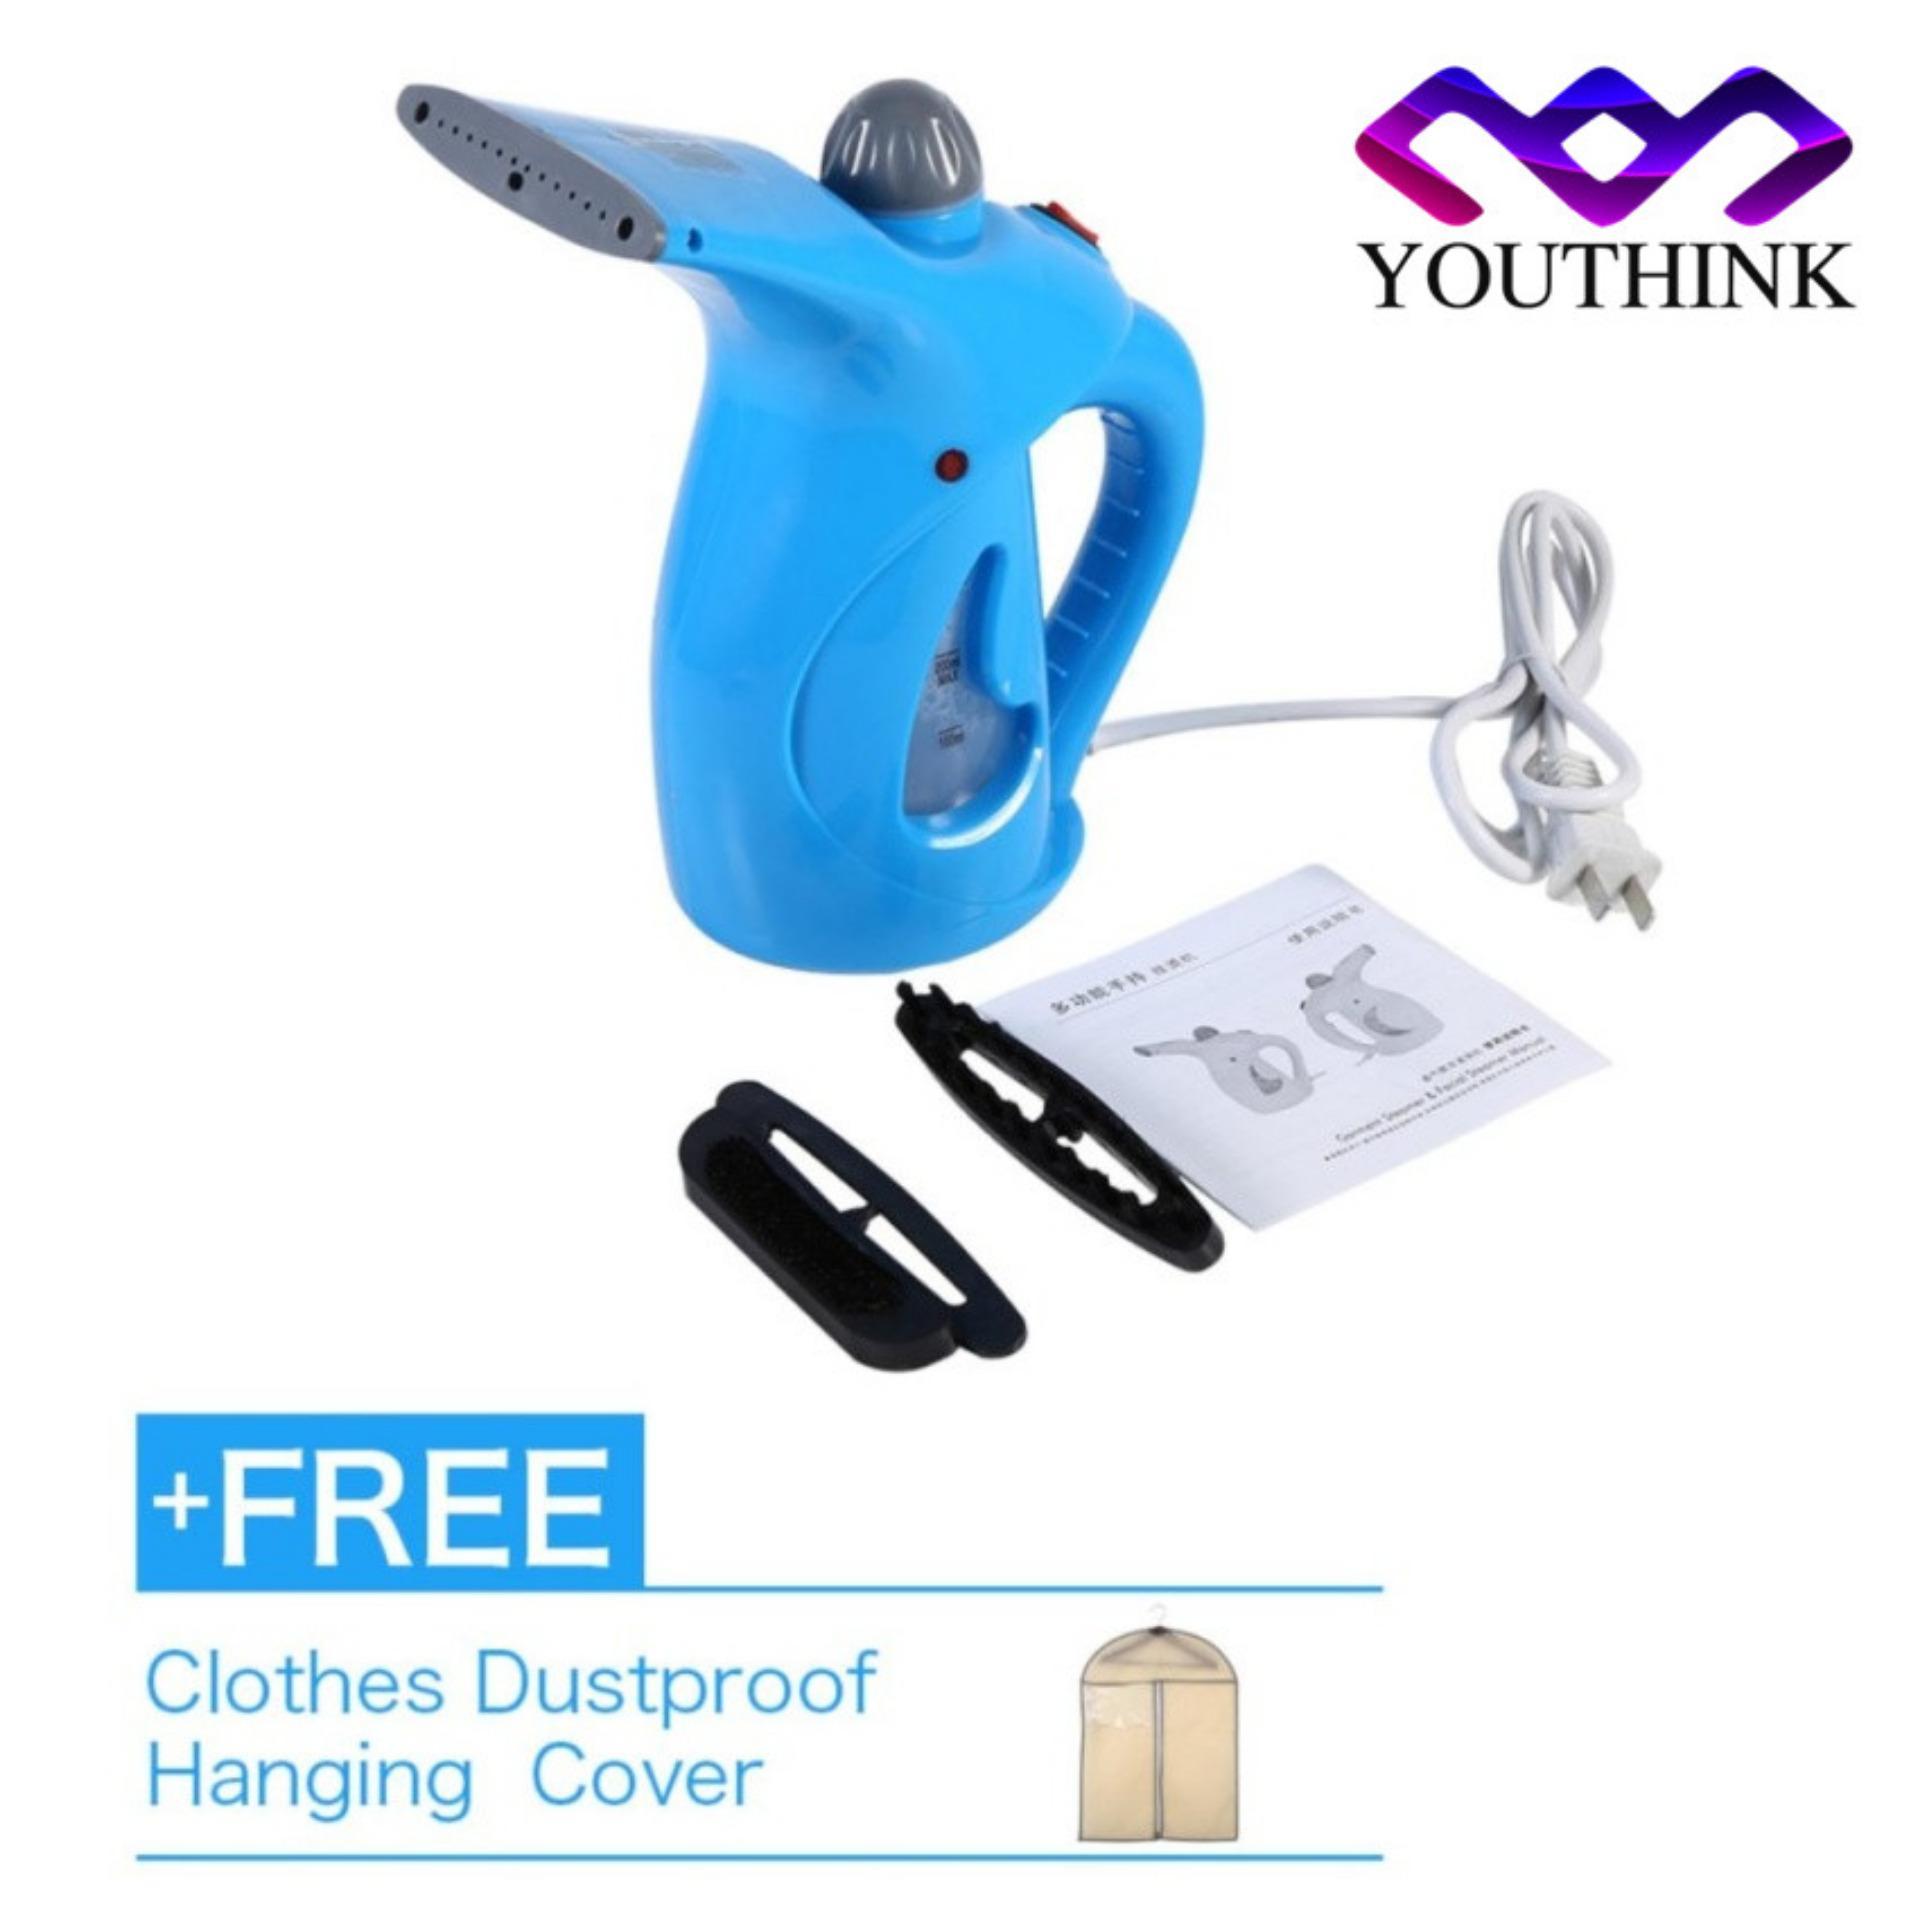 Portable Hand Iron Steam Garment Steamer Brush Blue Buy 1 Get 1 Free Clothes Dustproof Hanging Bag Intl Reviews